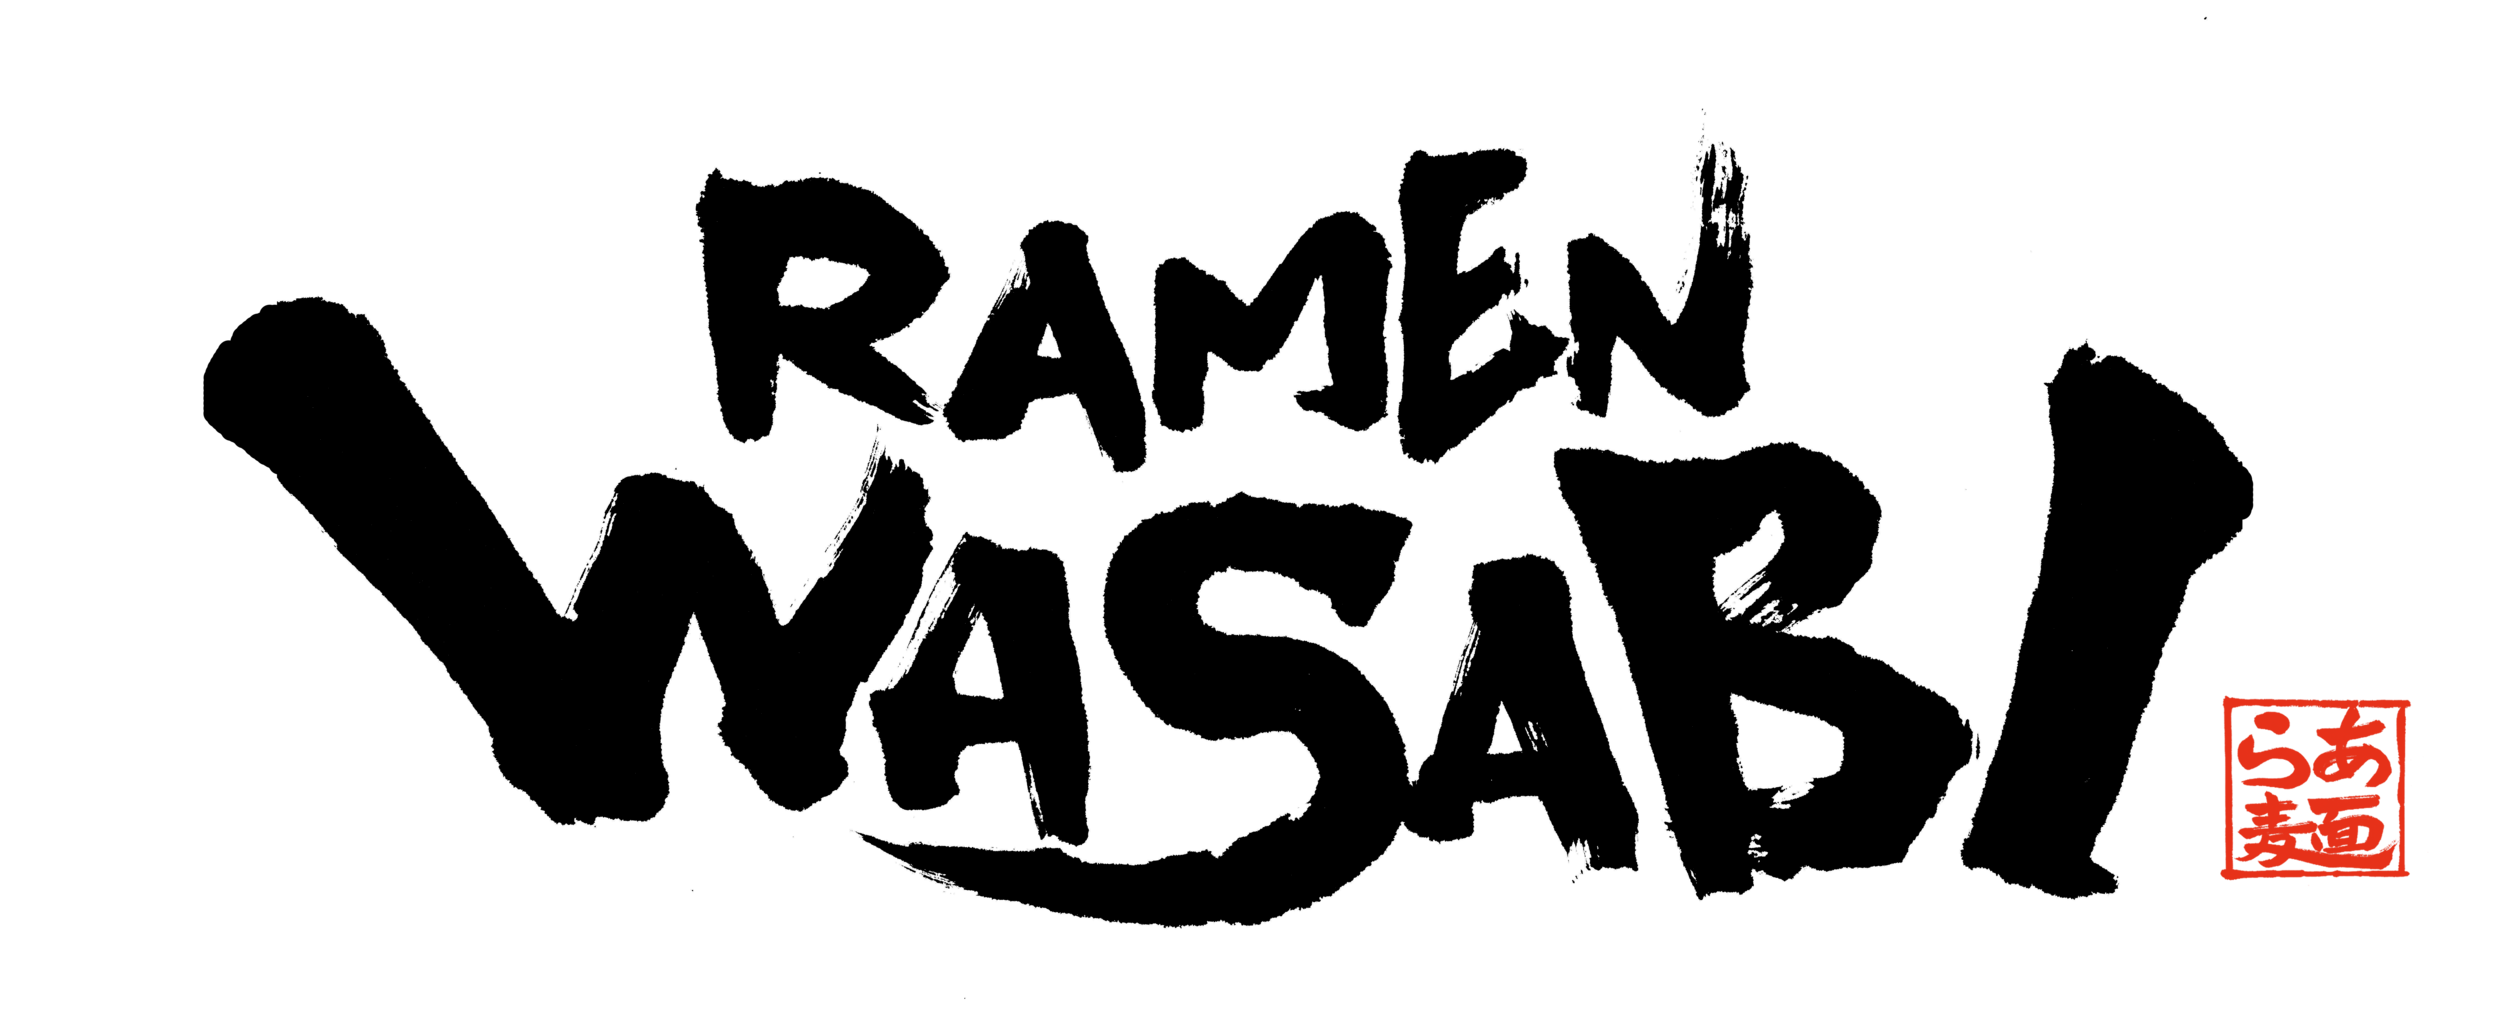 wasabi-draft-1-transparent-background.png